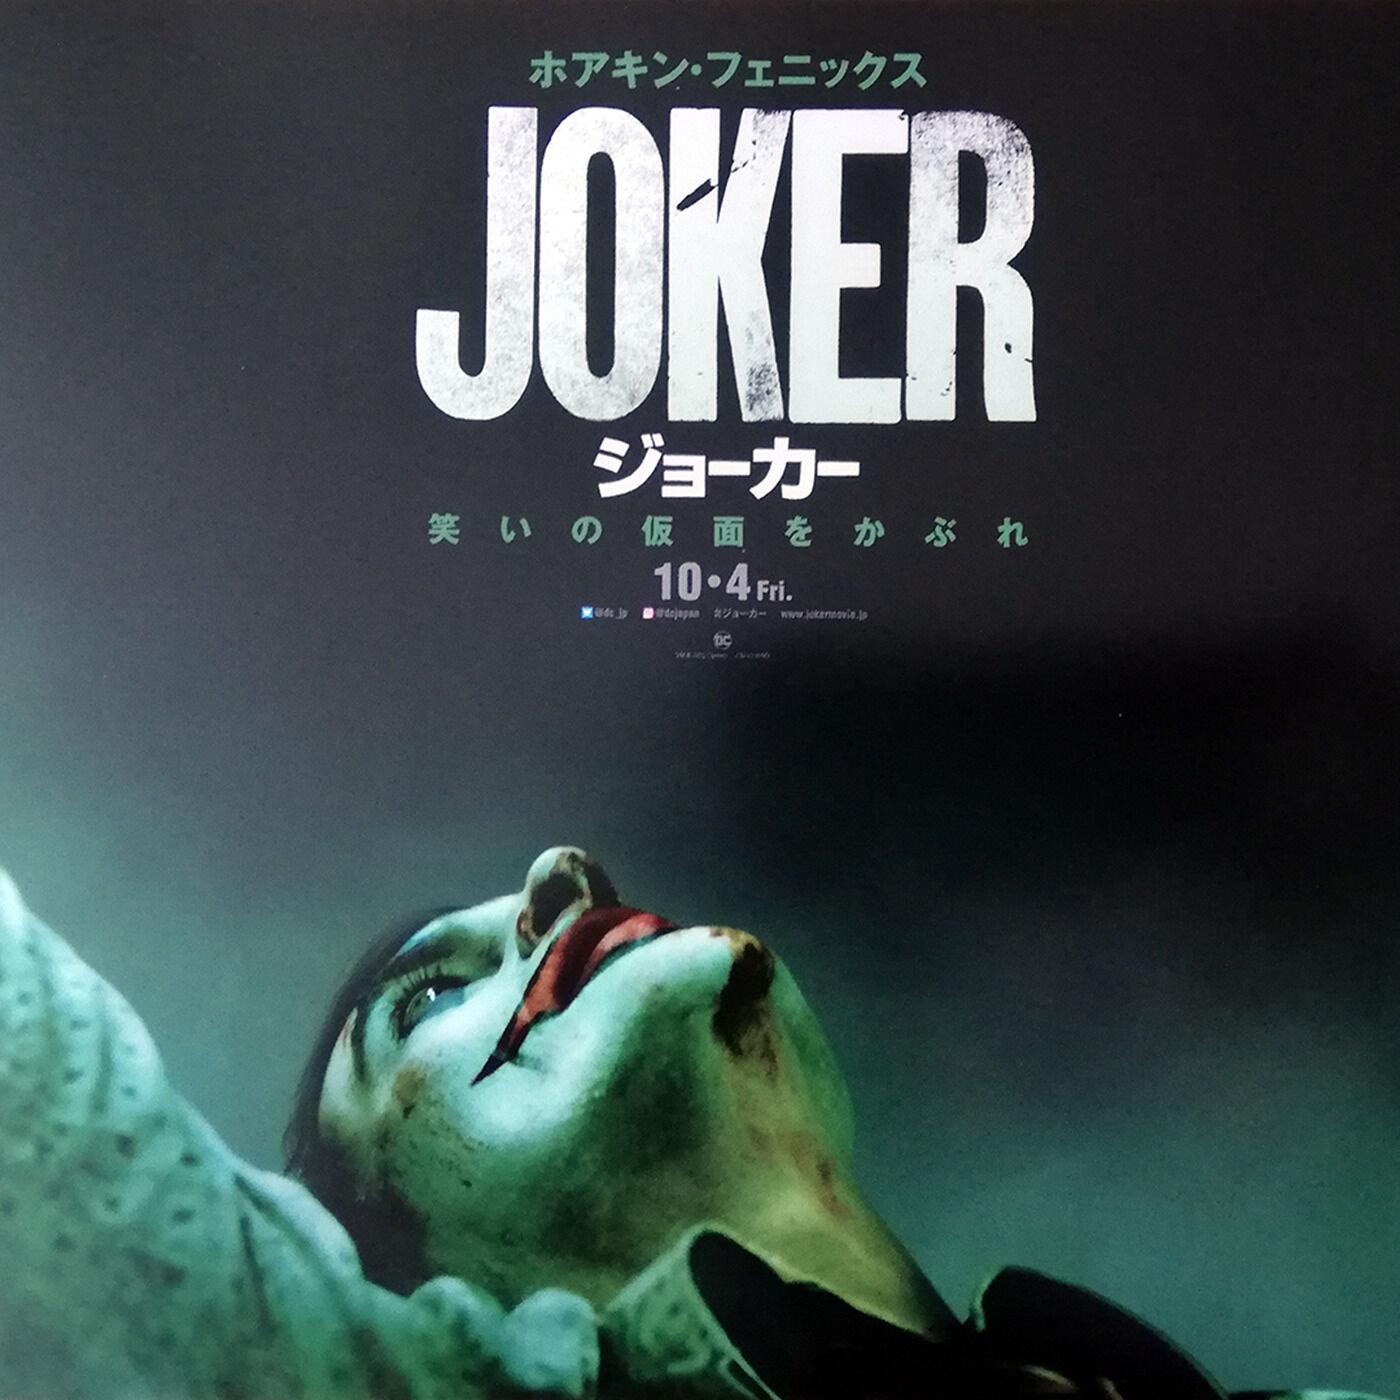 Episode 7: Joker